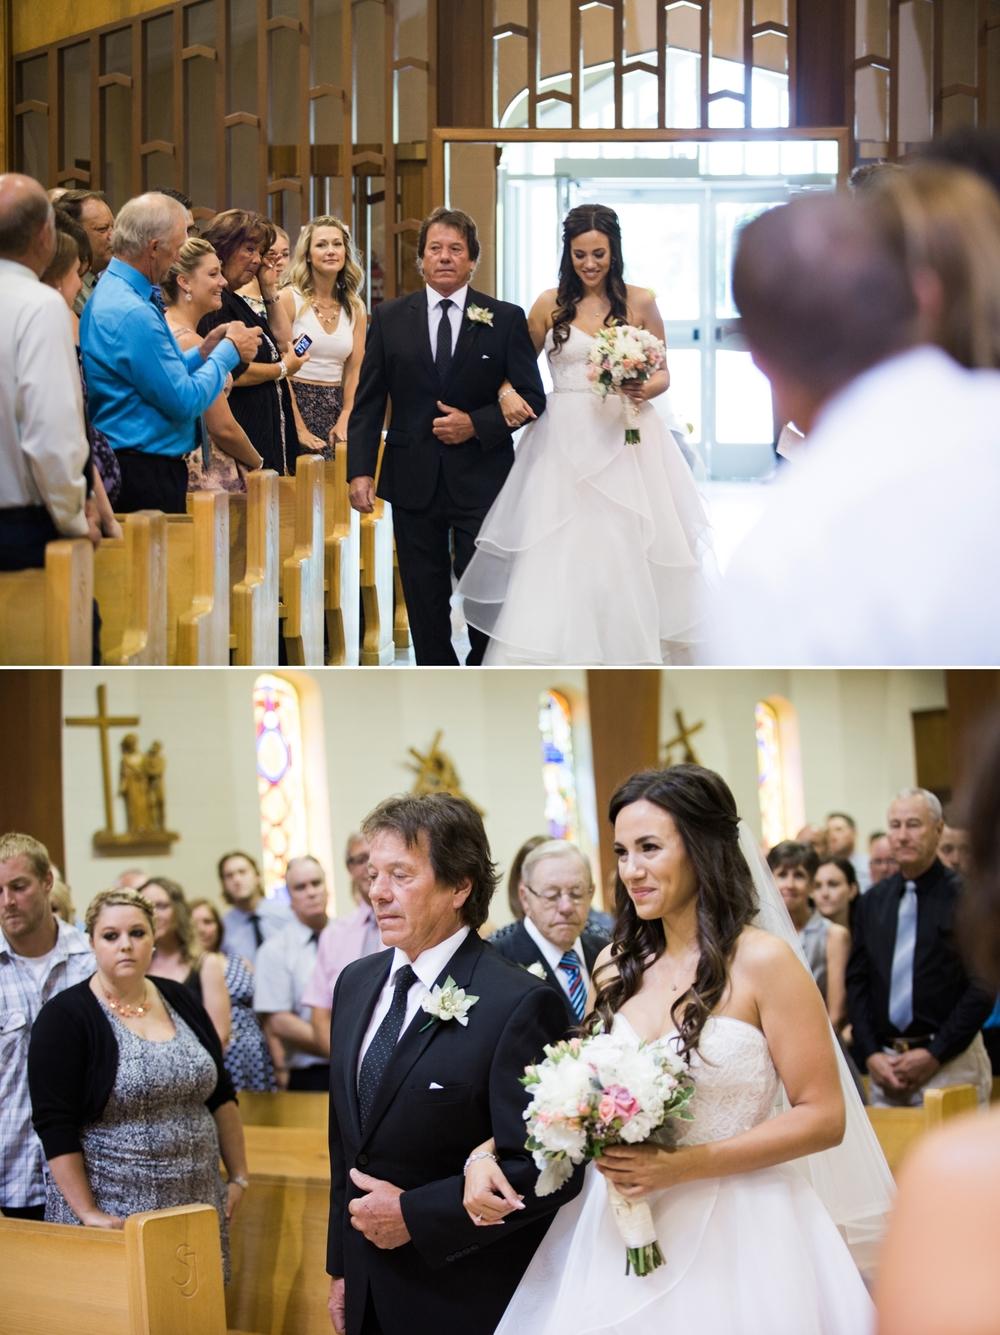 Ottawa Wedding Photography Prince Edward County Wedding Photography  42.jpg